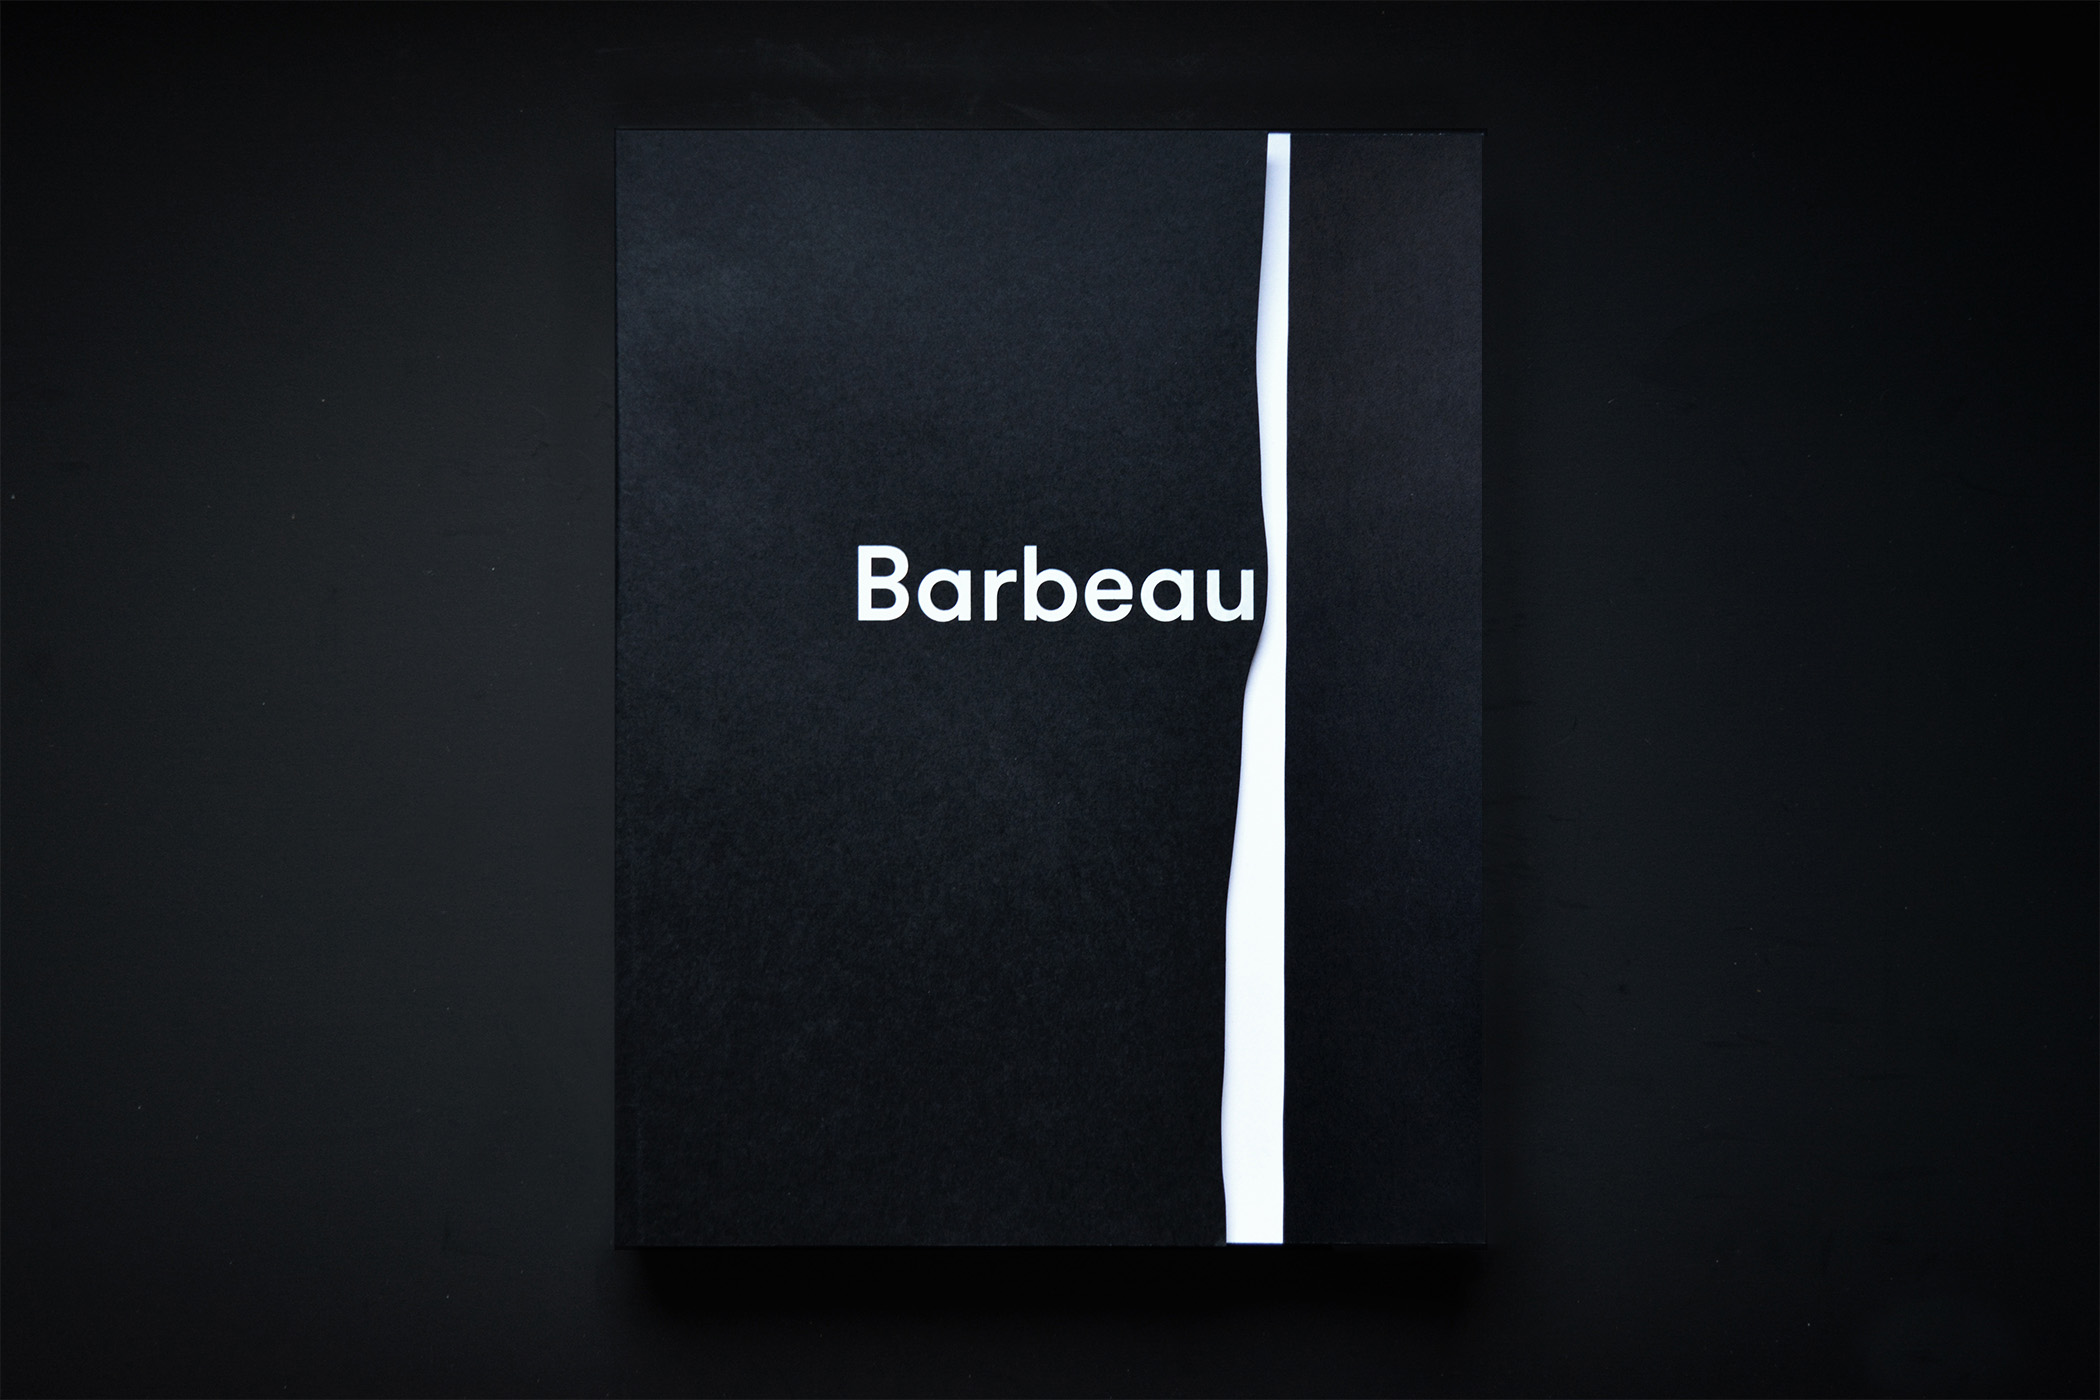 Marcel_Barbeau-01